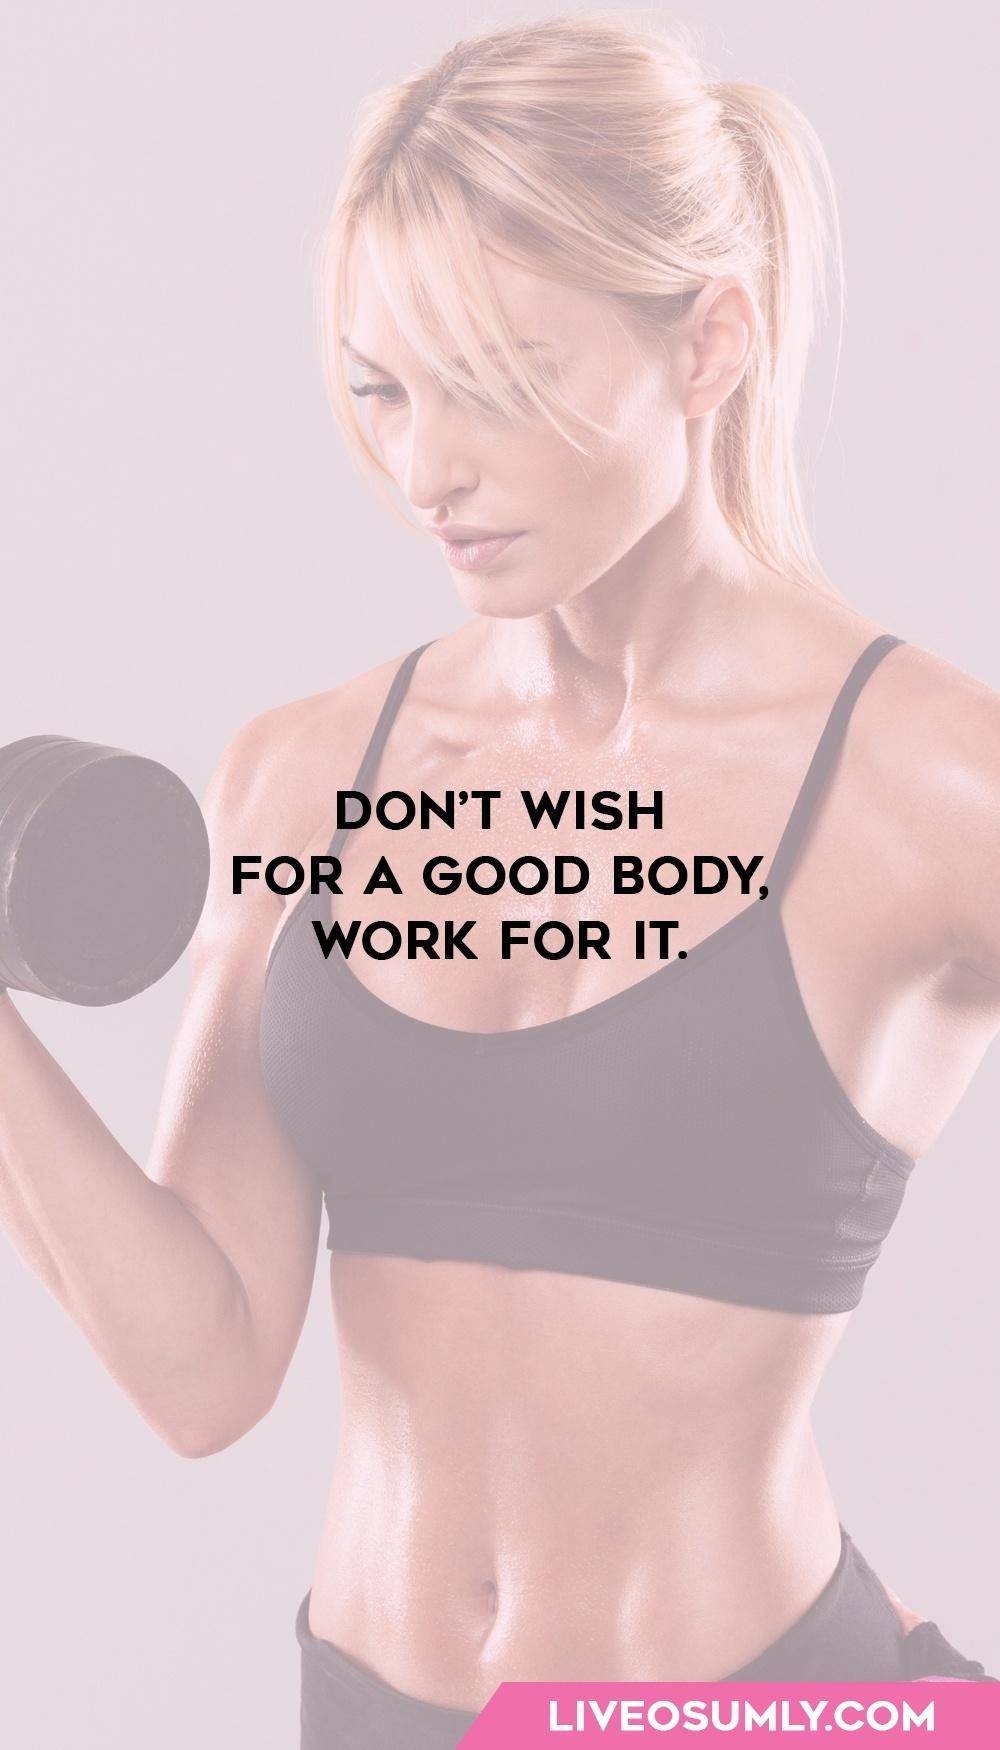 21. Best bodybuilding Quotes